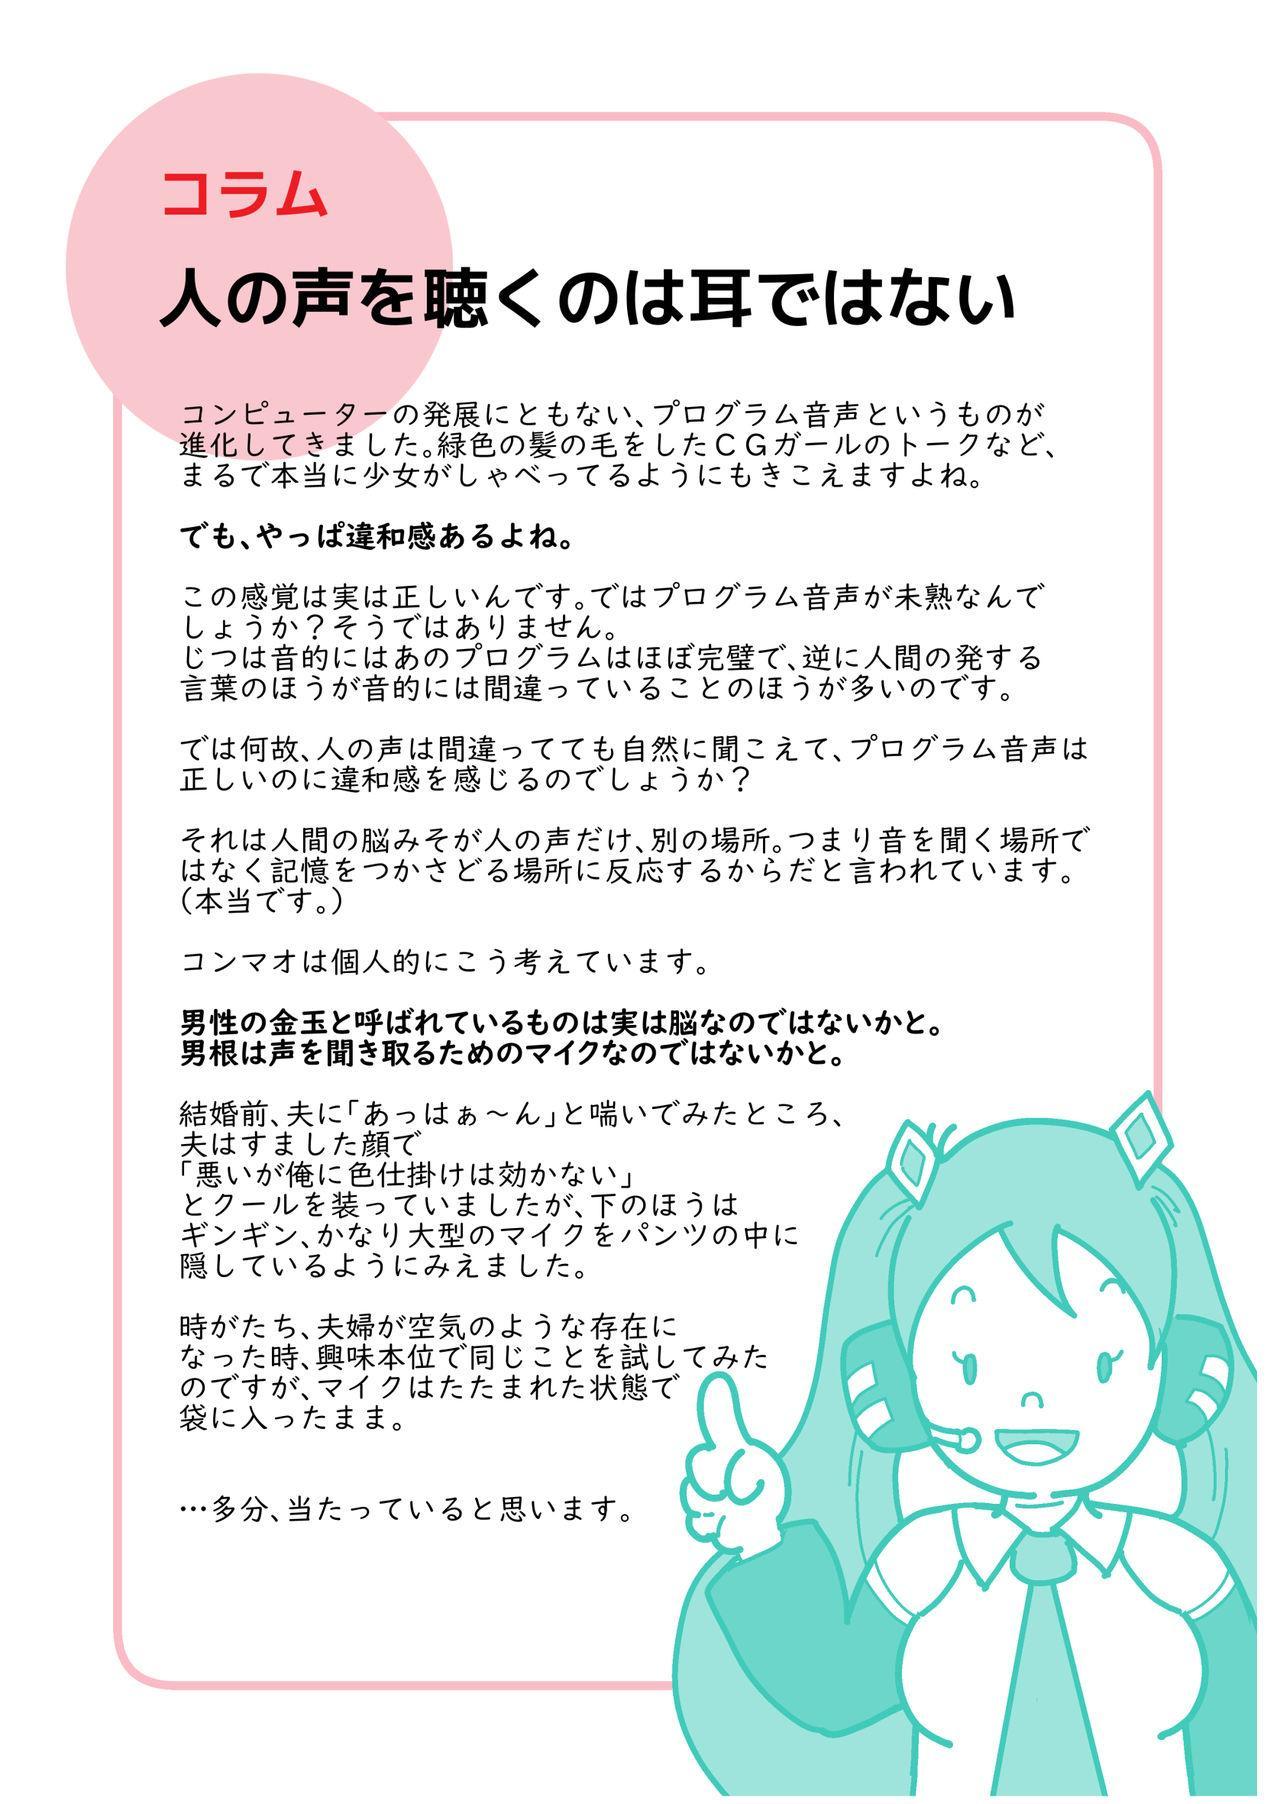 Isogasii Okaasan No Tamuno Sasa Rouzin Seikaigo | Guide for Elderly Sex Health Care to Busy Mom 23